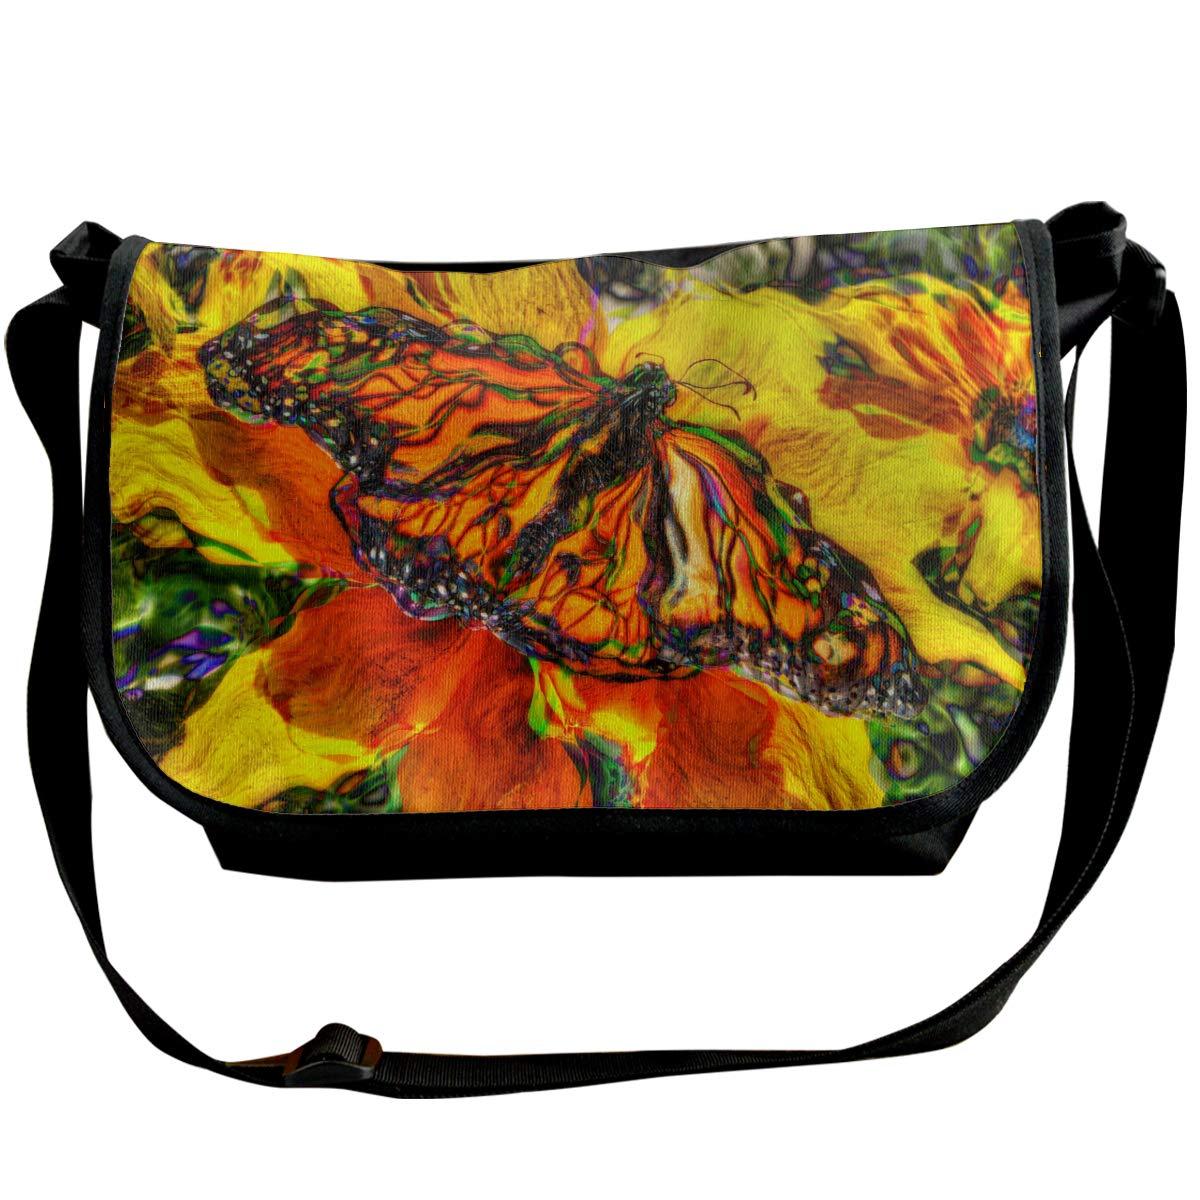 XIANGXIANG SHOP Van GOH Style Butterfly Fashion Unisex Casual Popular Outdoor Sling Bag Messenger Bag Shoulder Bag